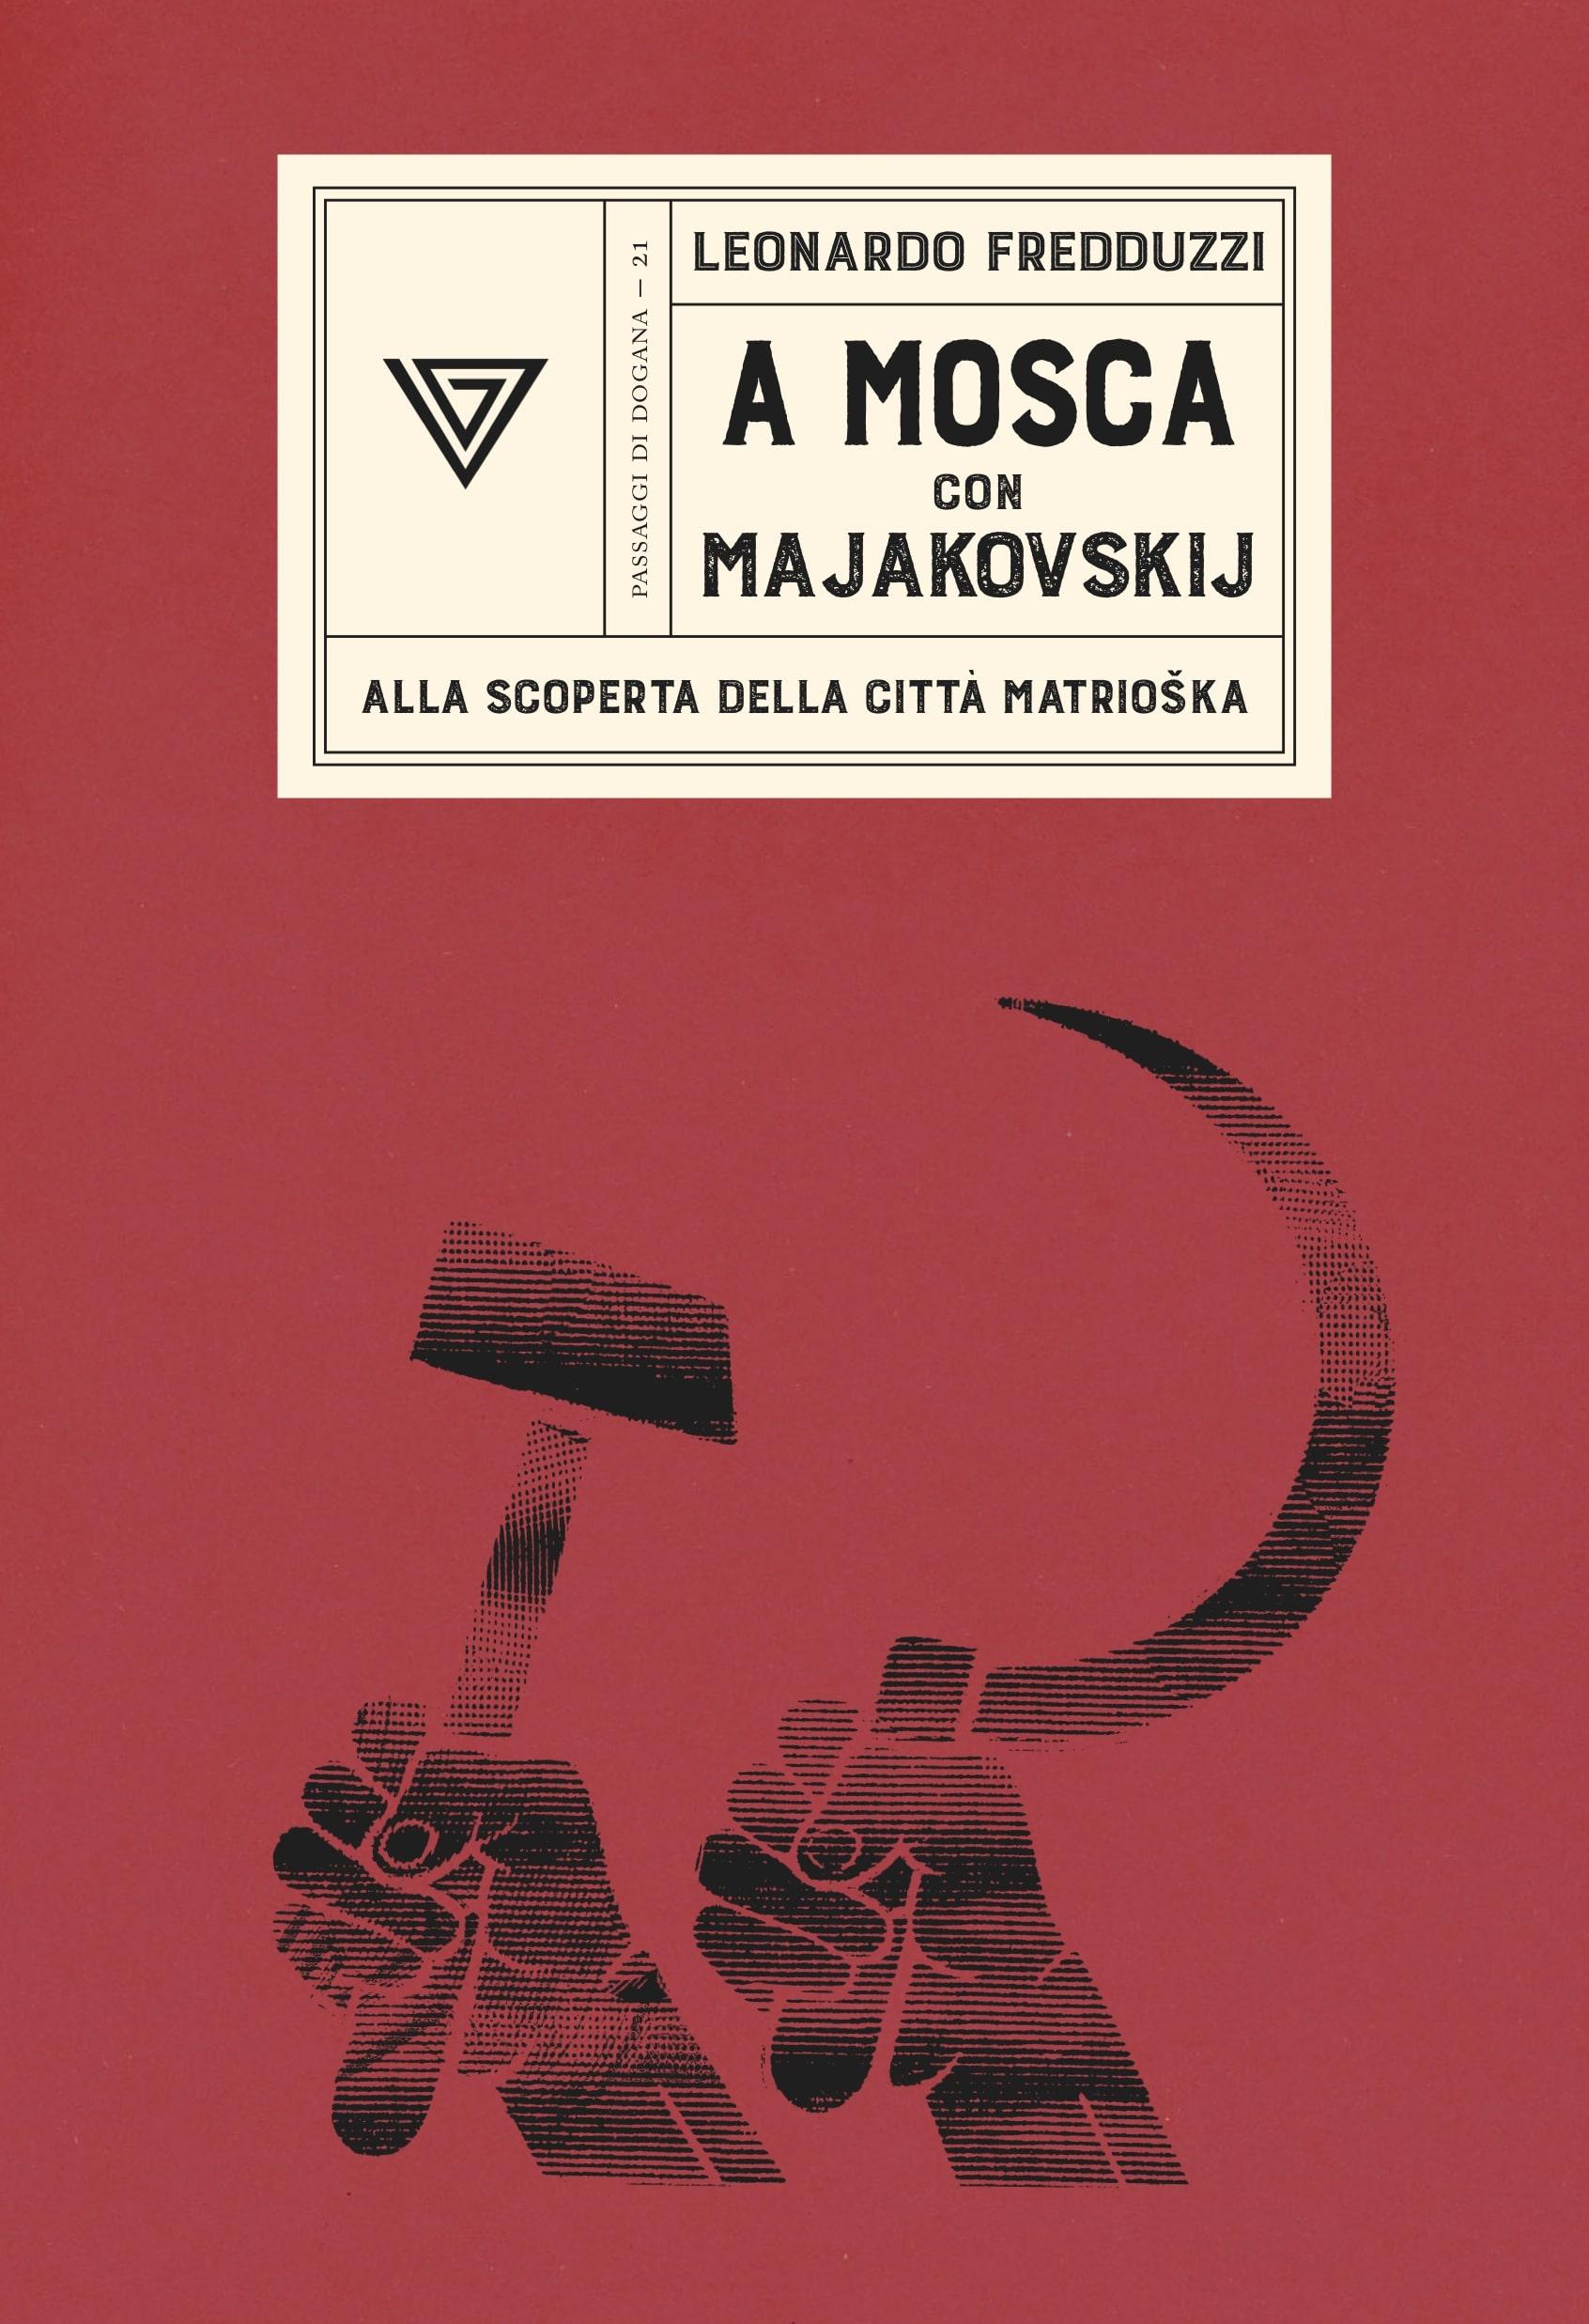 A Mosca con Majakovskij